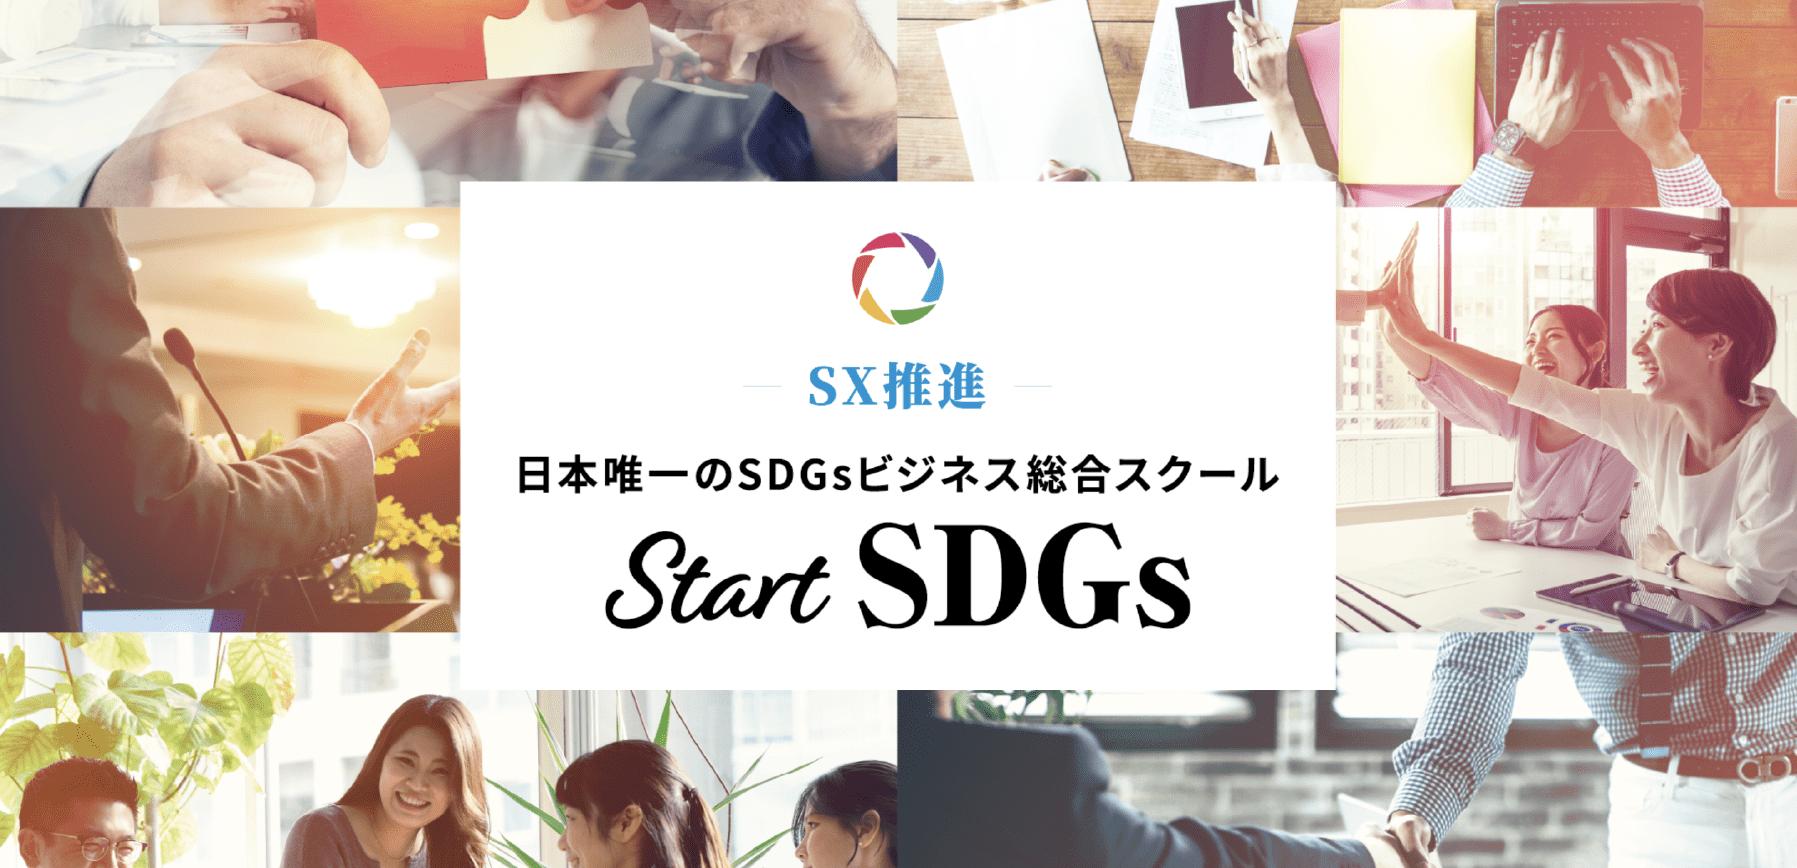 SX推進 日本唯一のSDGsビジネス総合スクール Start SDGs